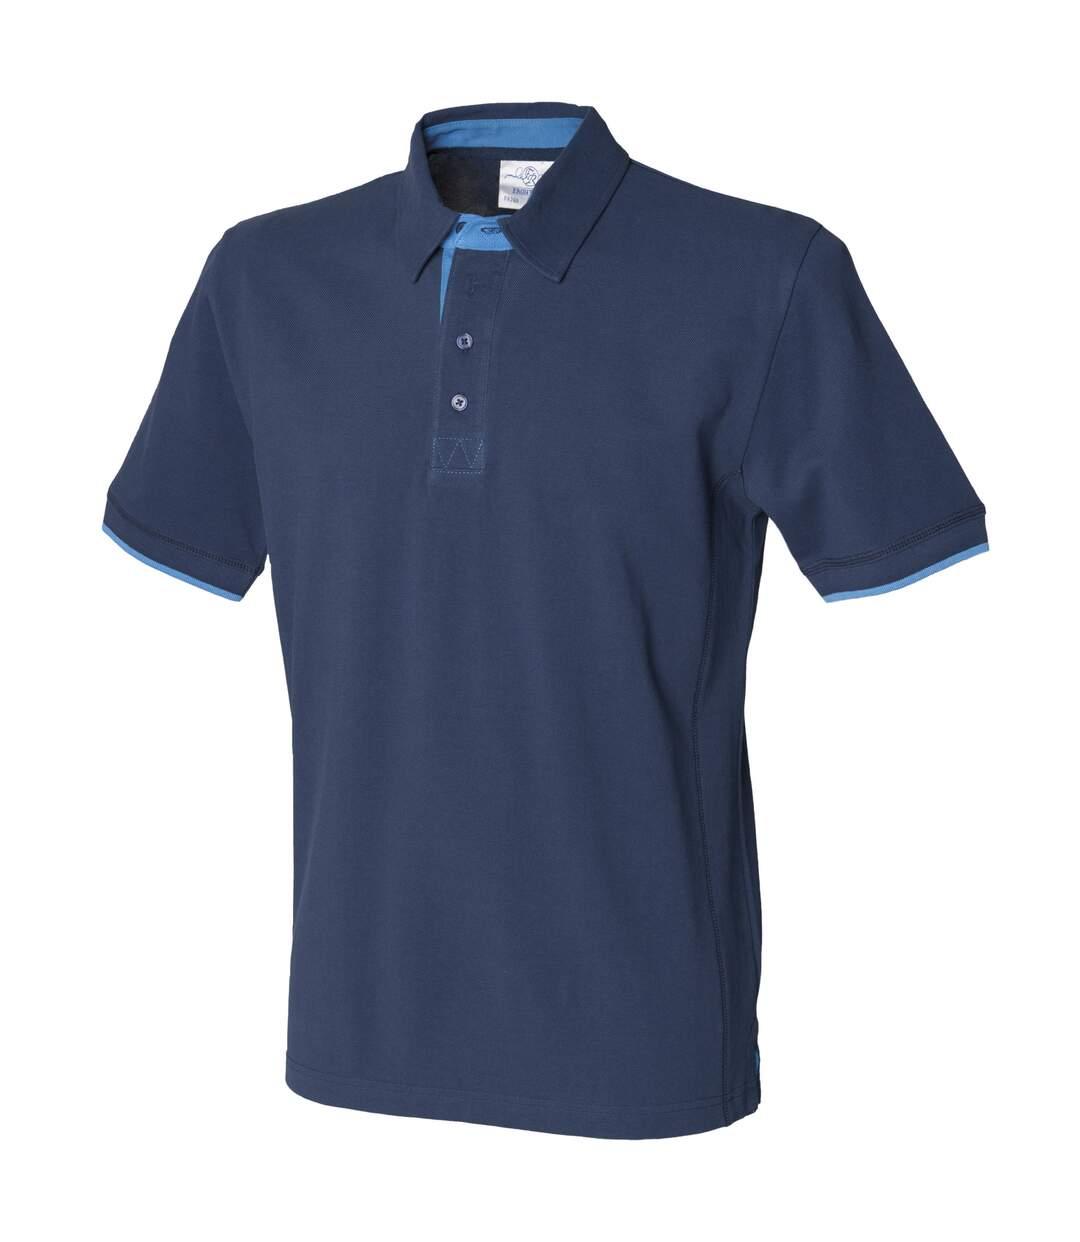 Front Row Mens Contrast Pique Polo Shirt (Navy/Marine) - UTRW486